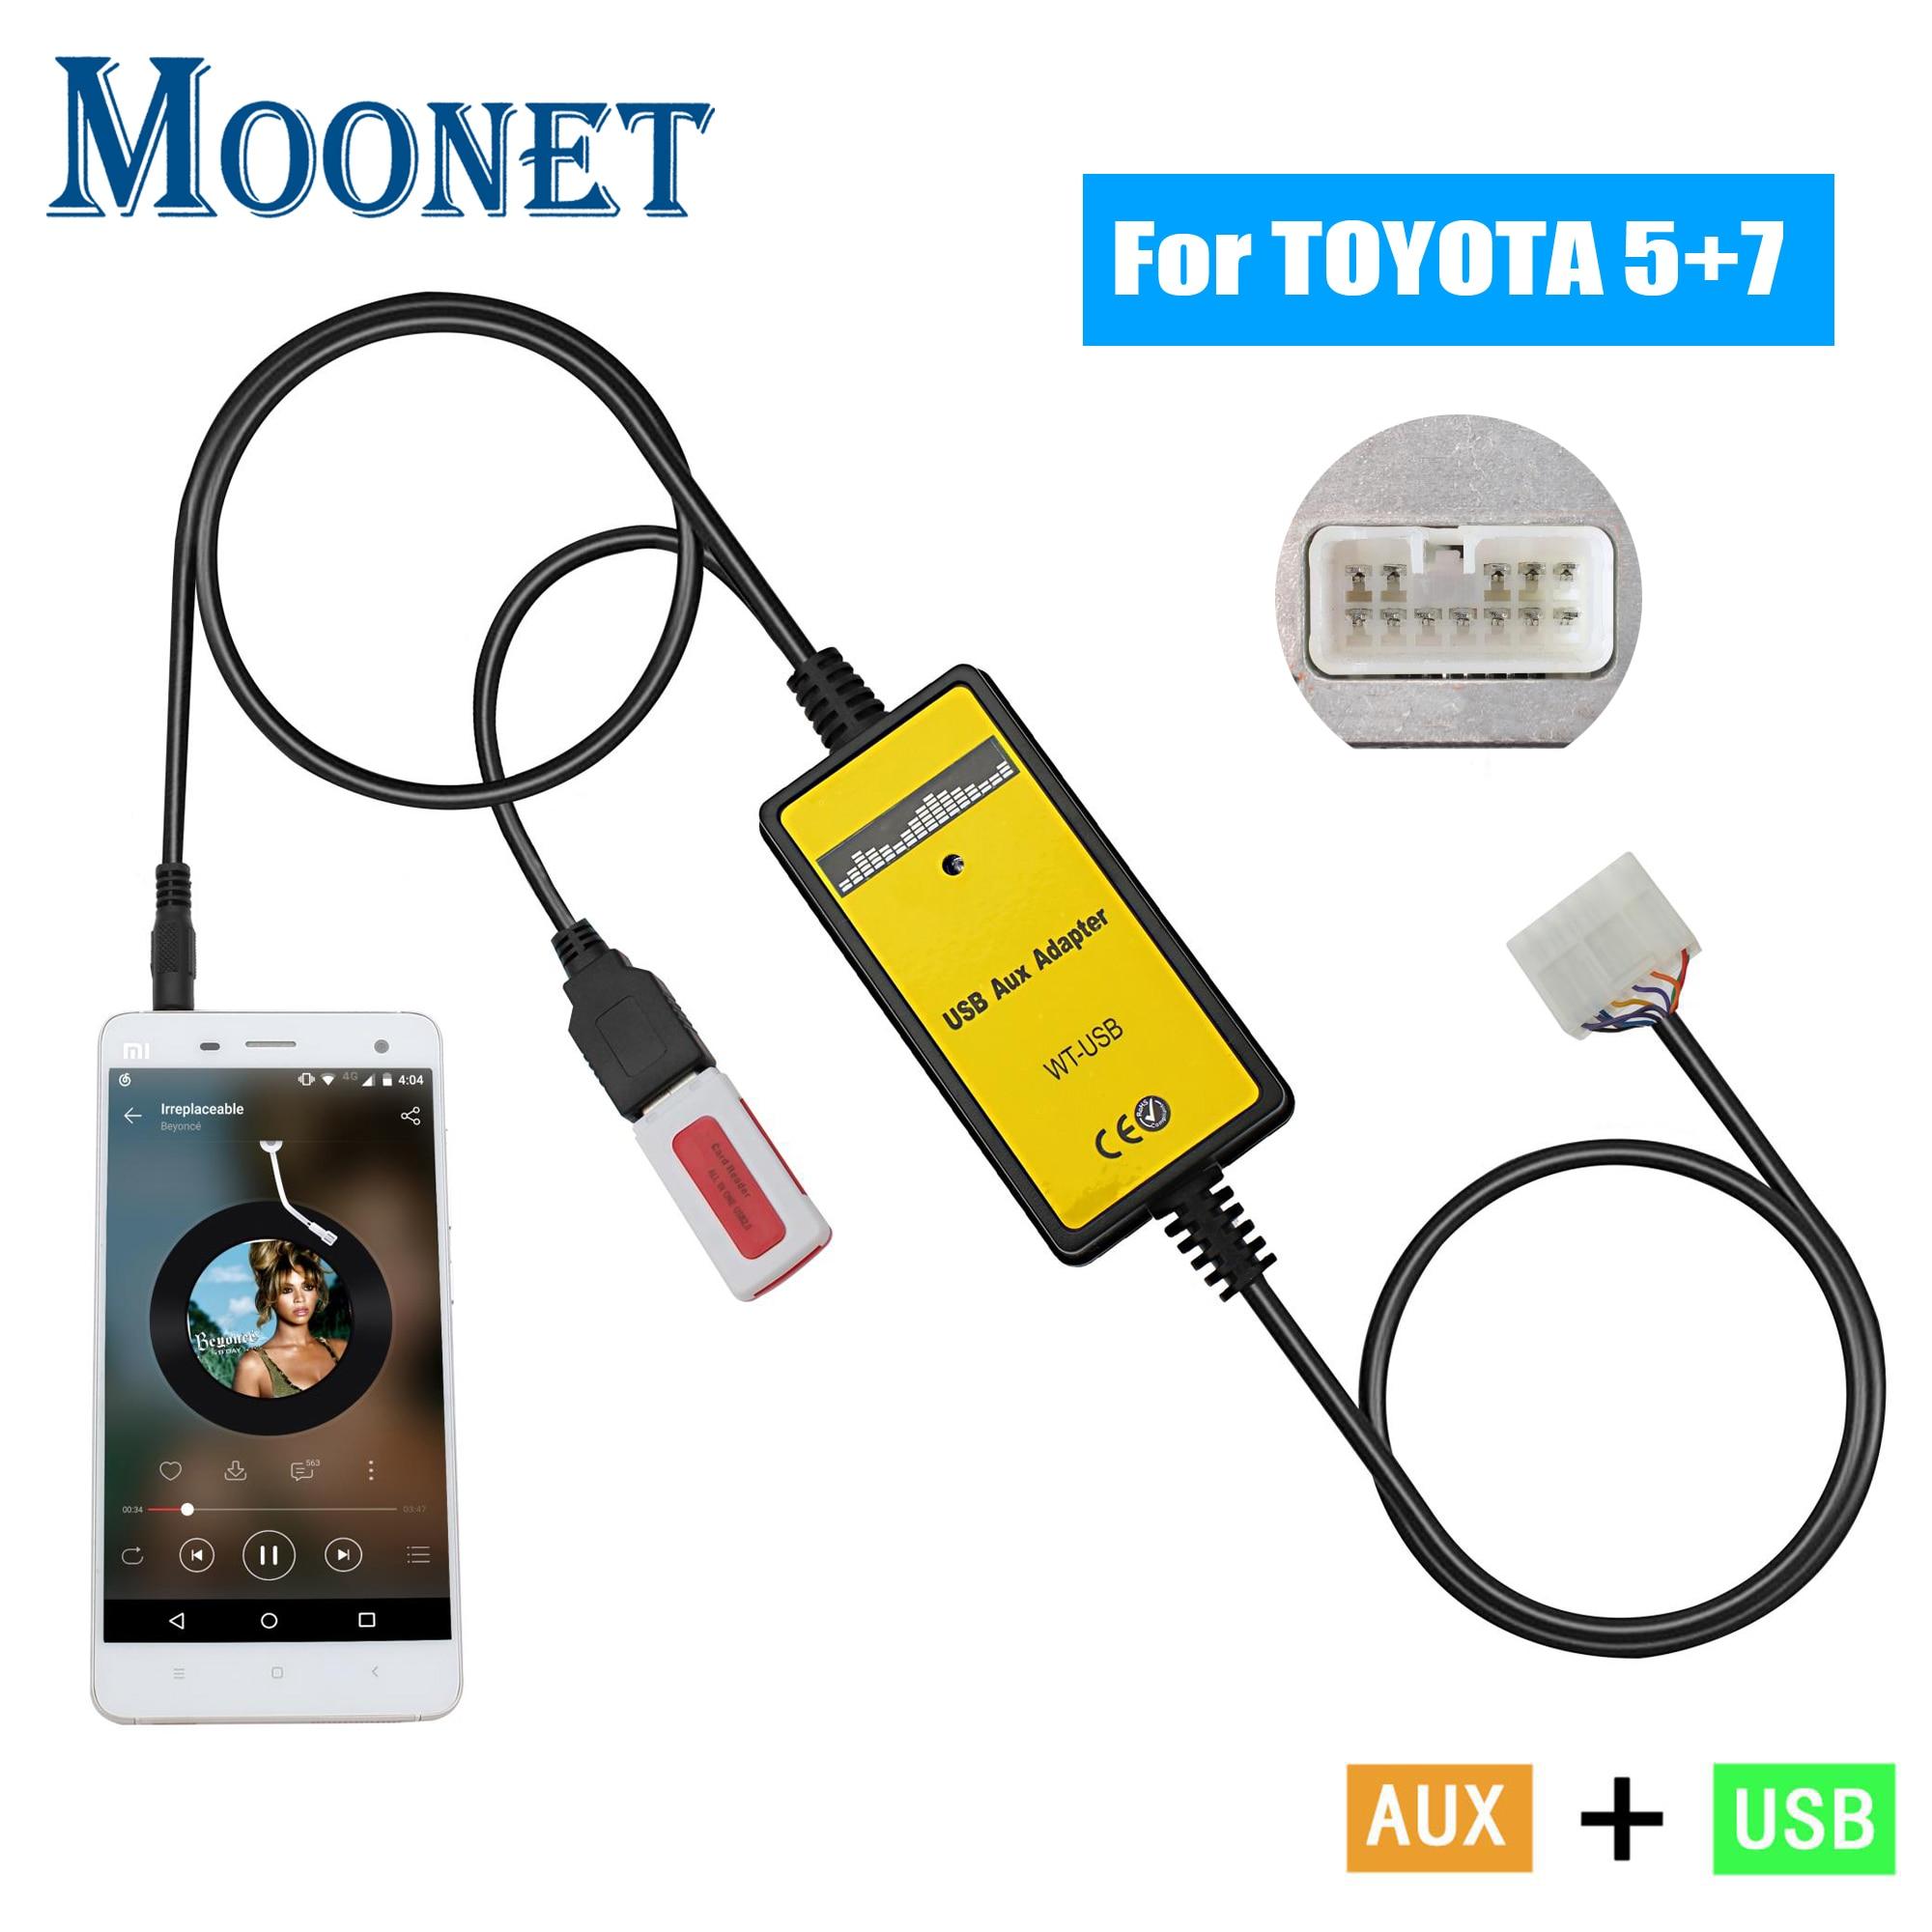 Moonet Автомобильный MP3 AUX USB интерфейс CD Changer 3,5 мм AUX адаптер для Toyota (5 + 7pin) Yaris Camry Corolla Avensis RAV4 QX018